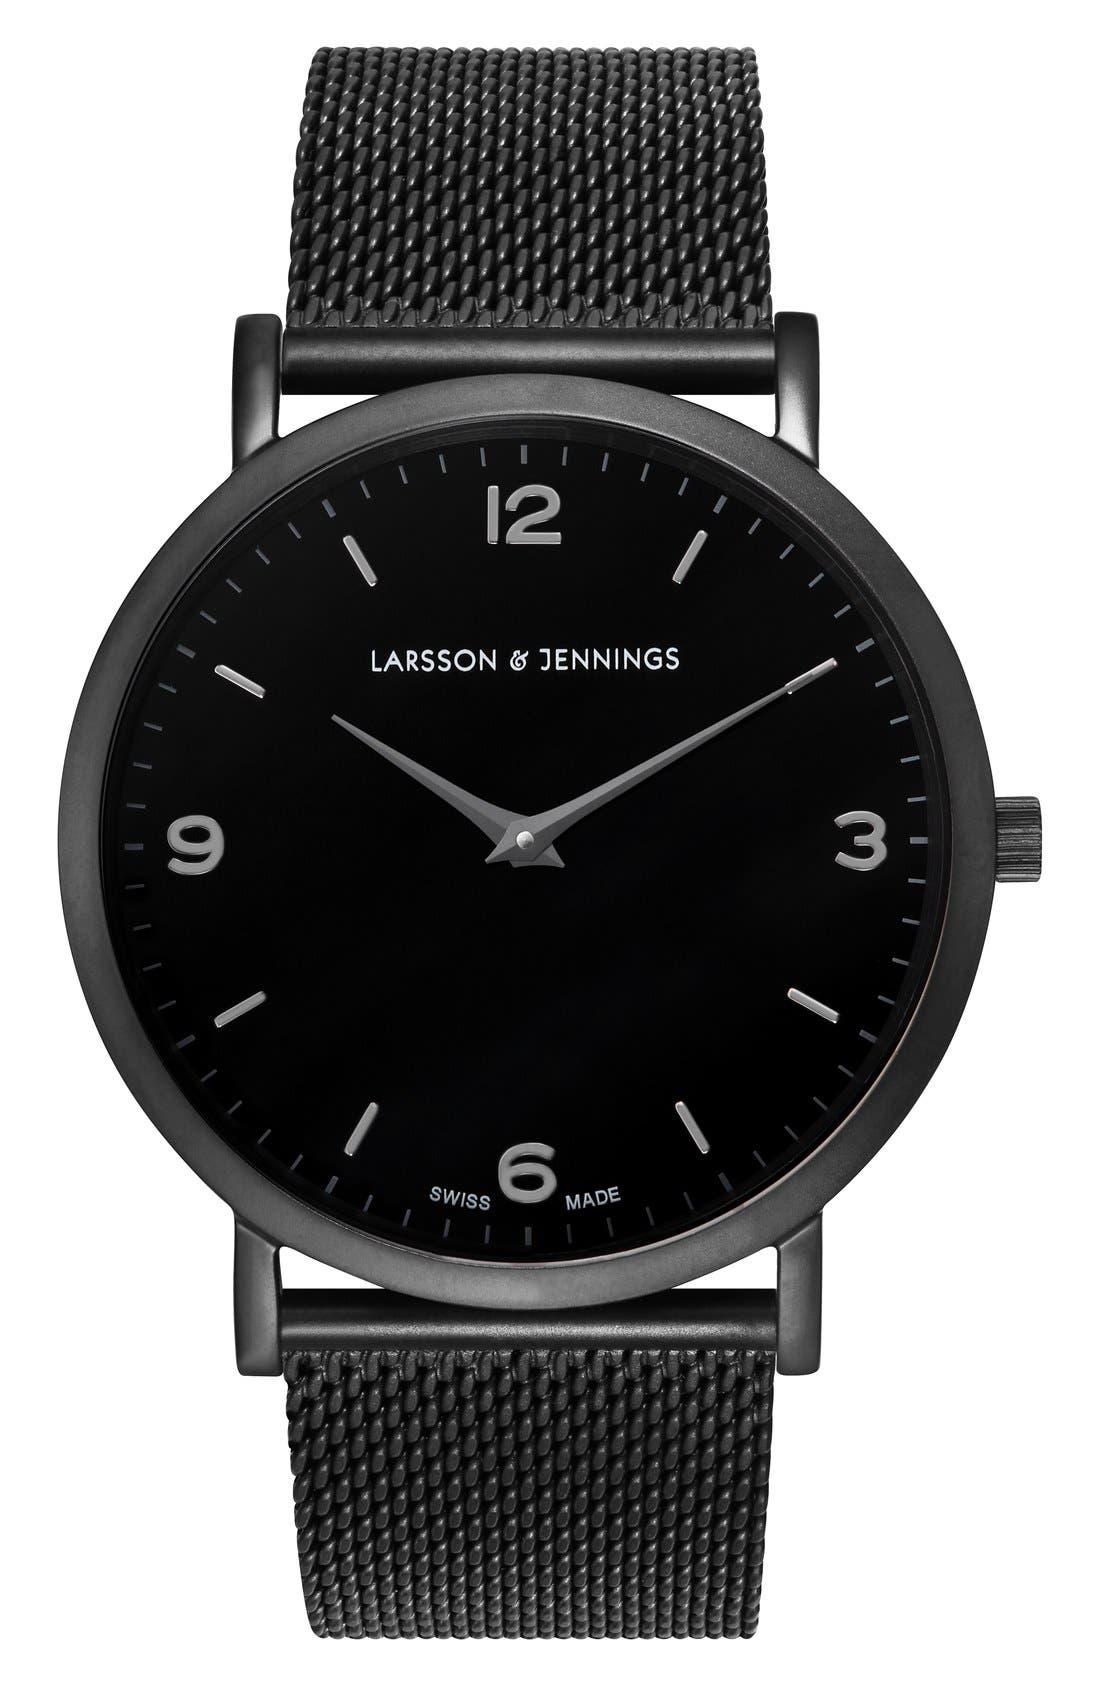 LARSSON & JENNINGS, Lugano Mesh Strap Watch, 38mm, Main thumbnail 1, color, 001